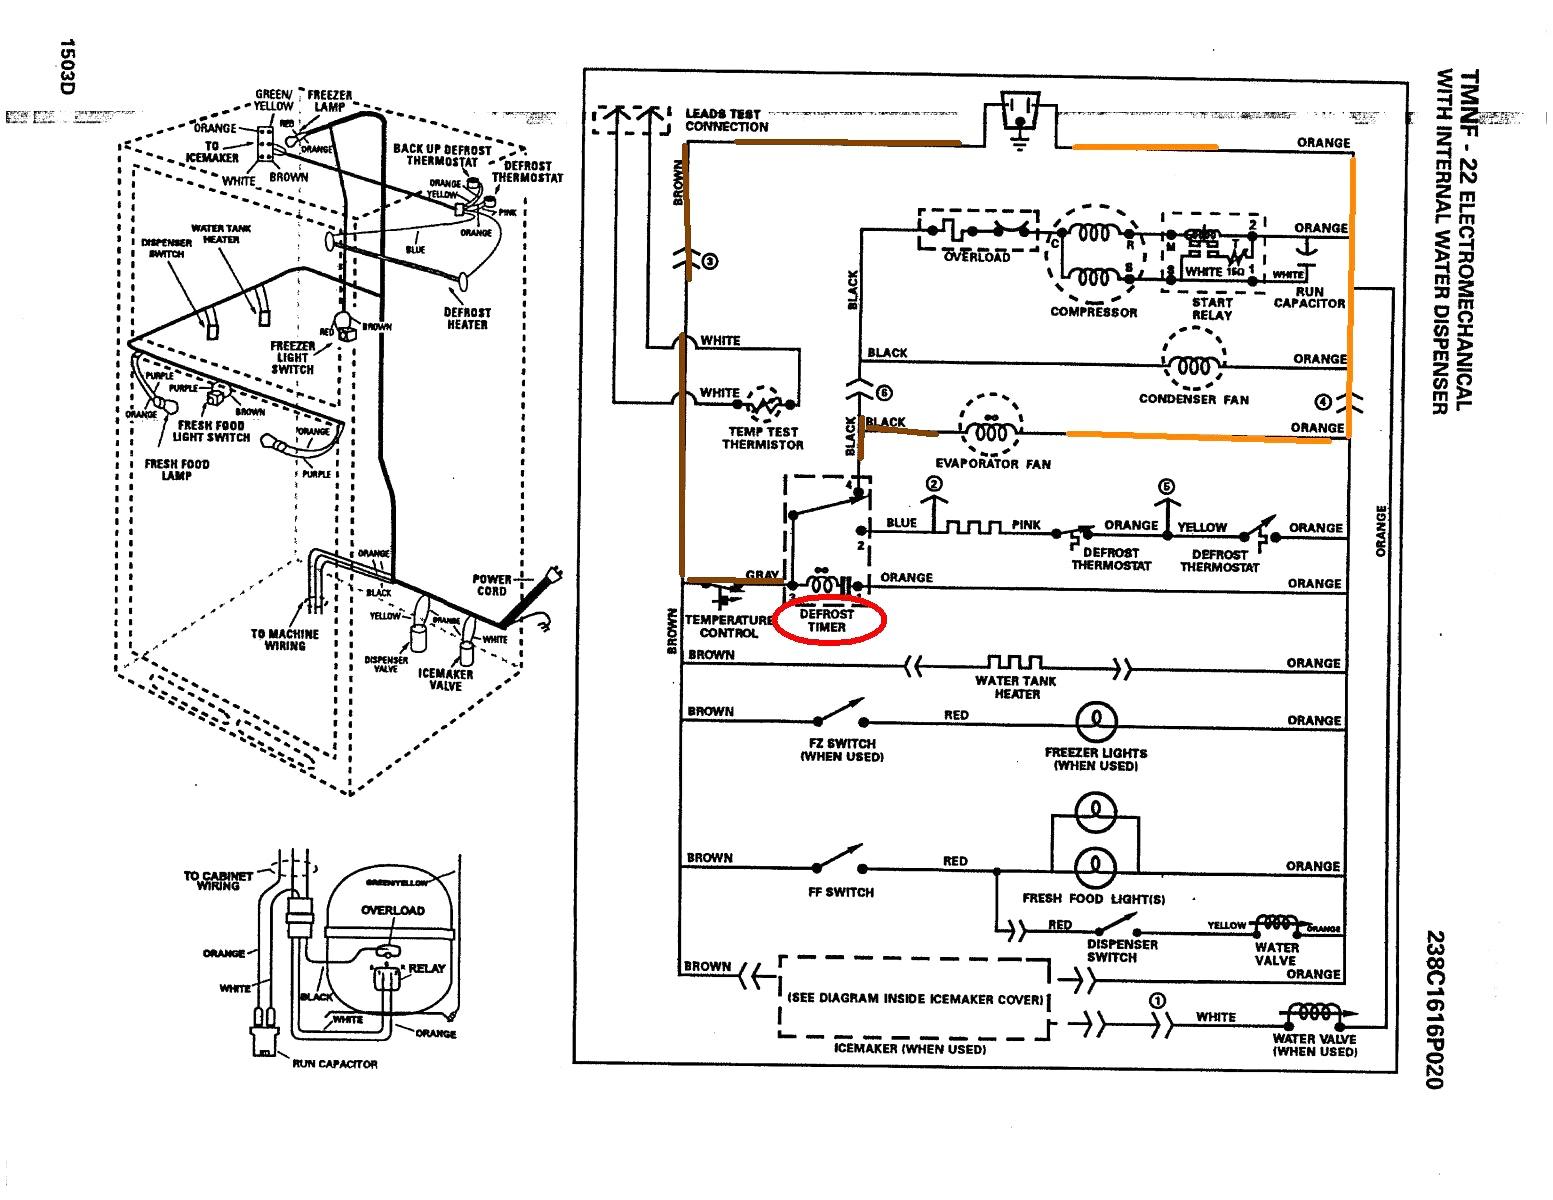 Lg Refrigerator Electrical Wiring Diagram Pdf   Bege Wiring DiagramBege Wiring Diagram